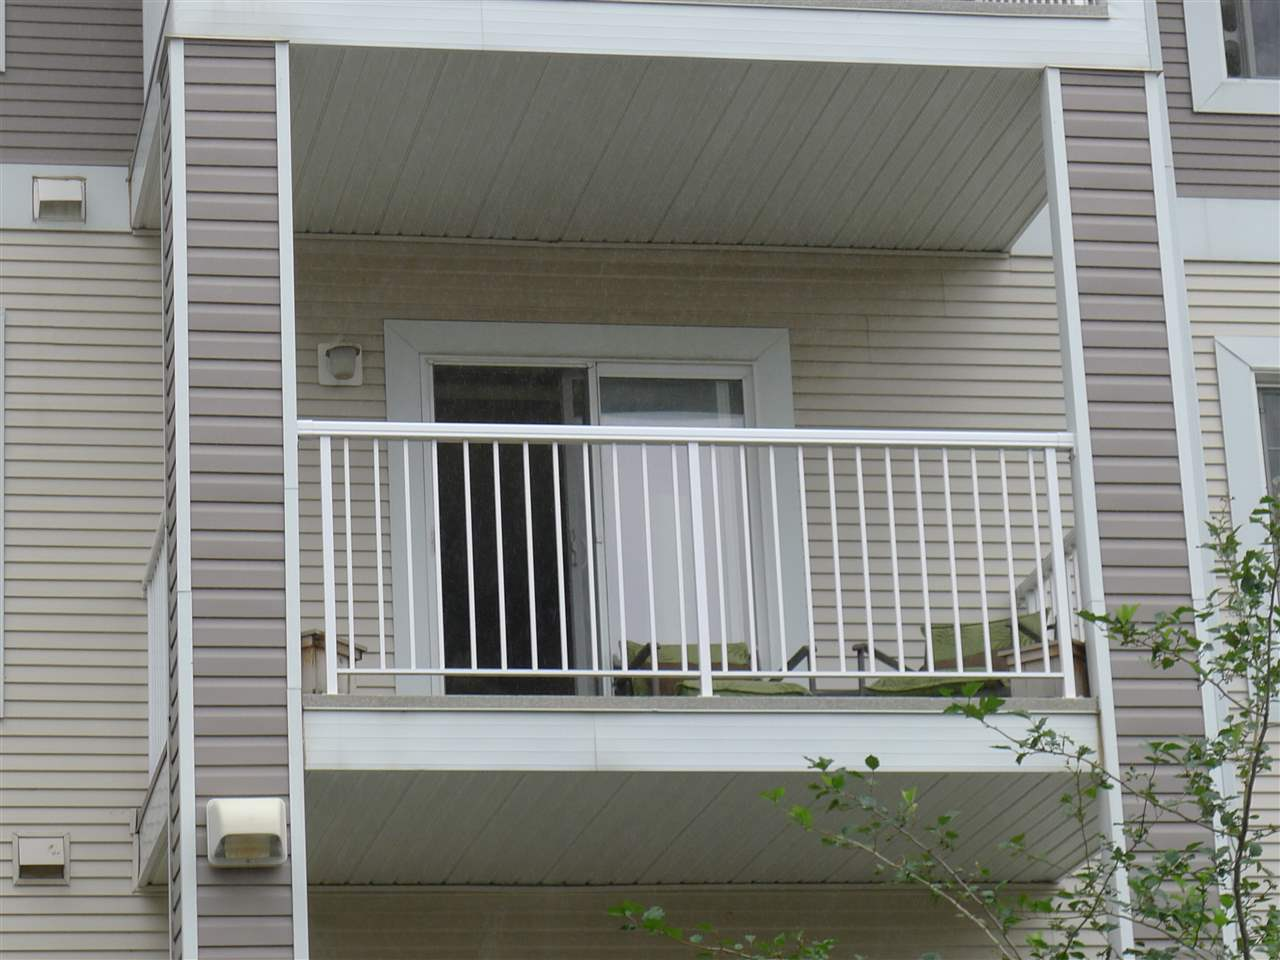 Buliding: 4403 23 Street, Edmonton, AB